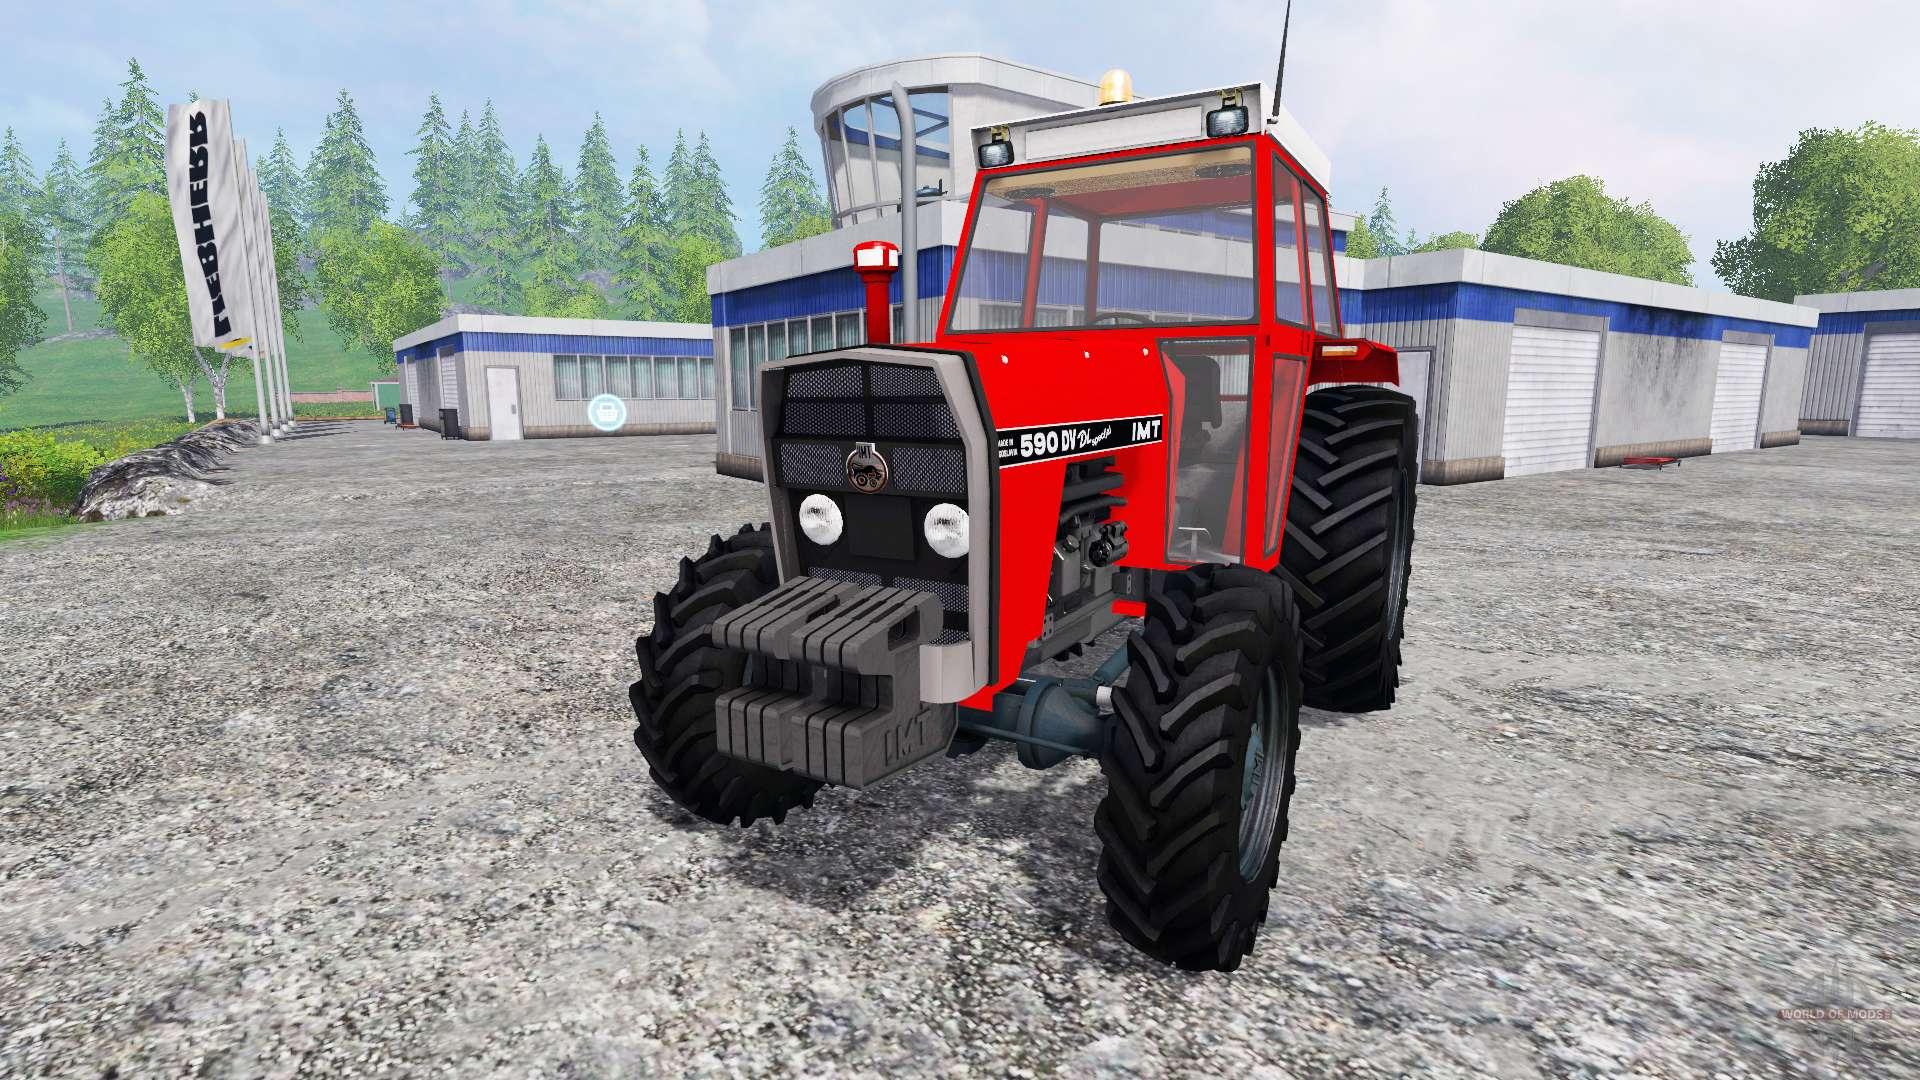 Imt 590 Dv V2 0 For Farming Simulator 2015